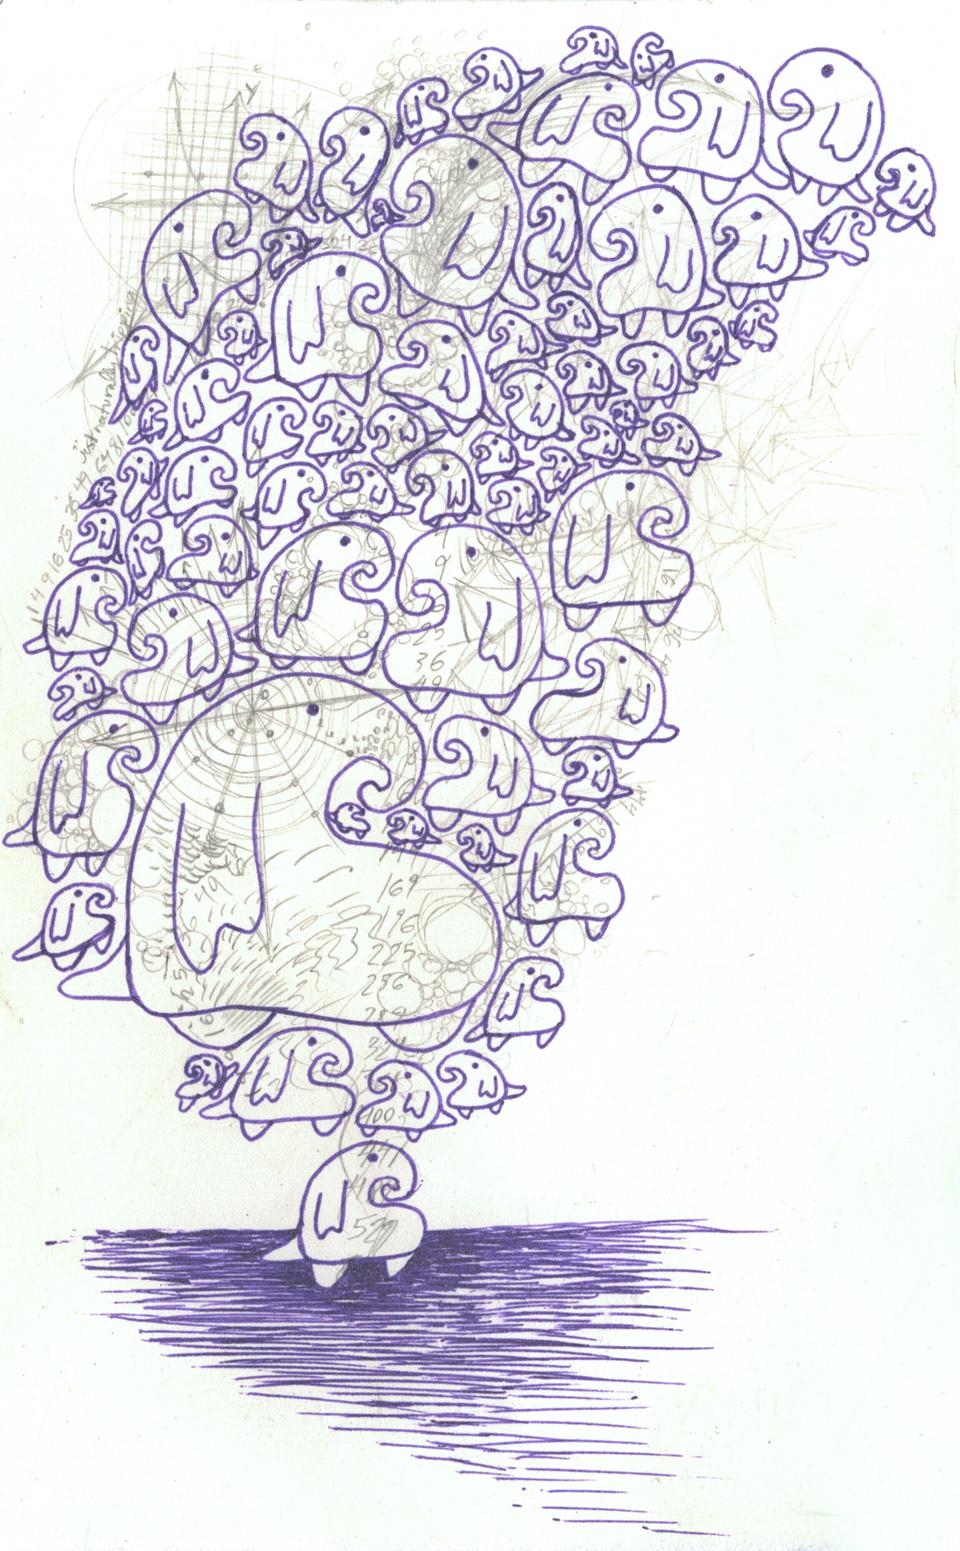 Thinking Proboscis